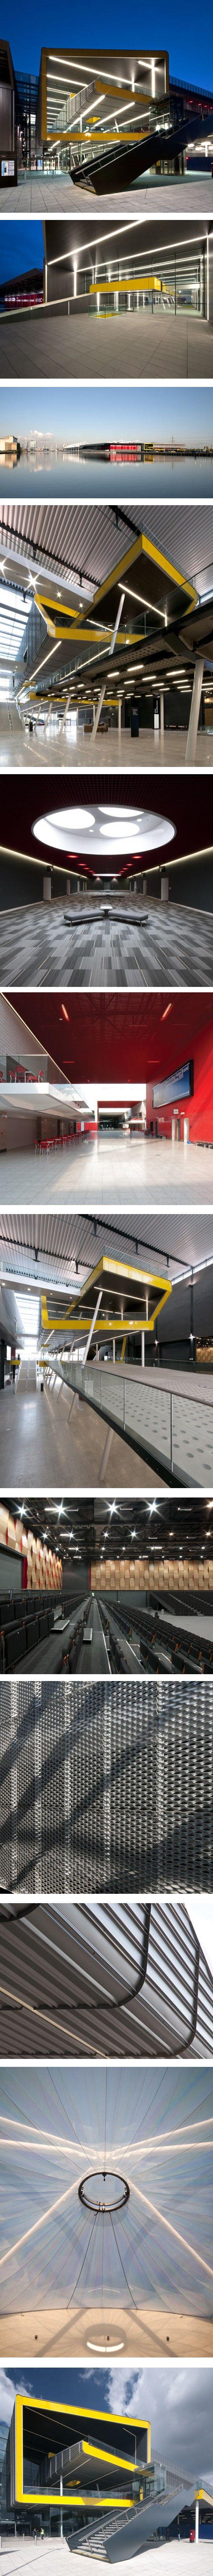 ARCHITECTURE >>> ExCel Phase II par Grimshaw - Journal du Design